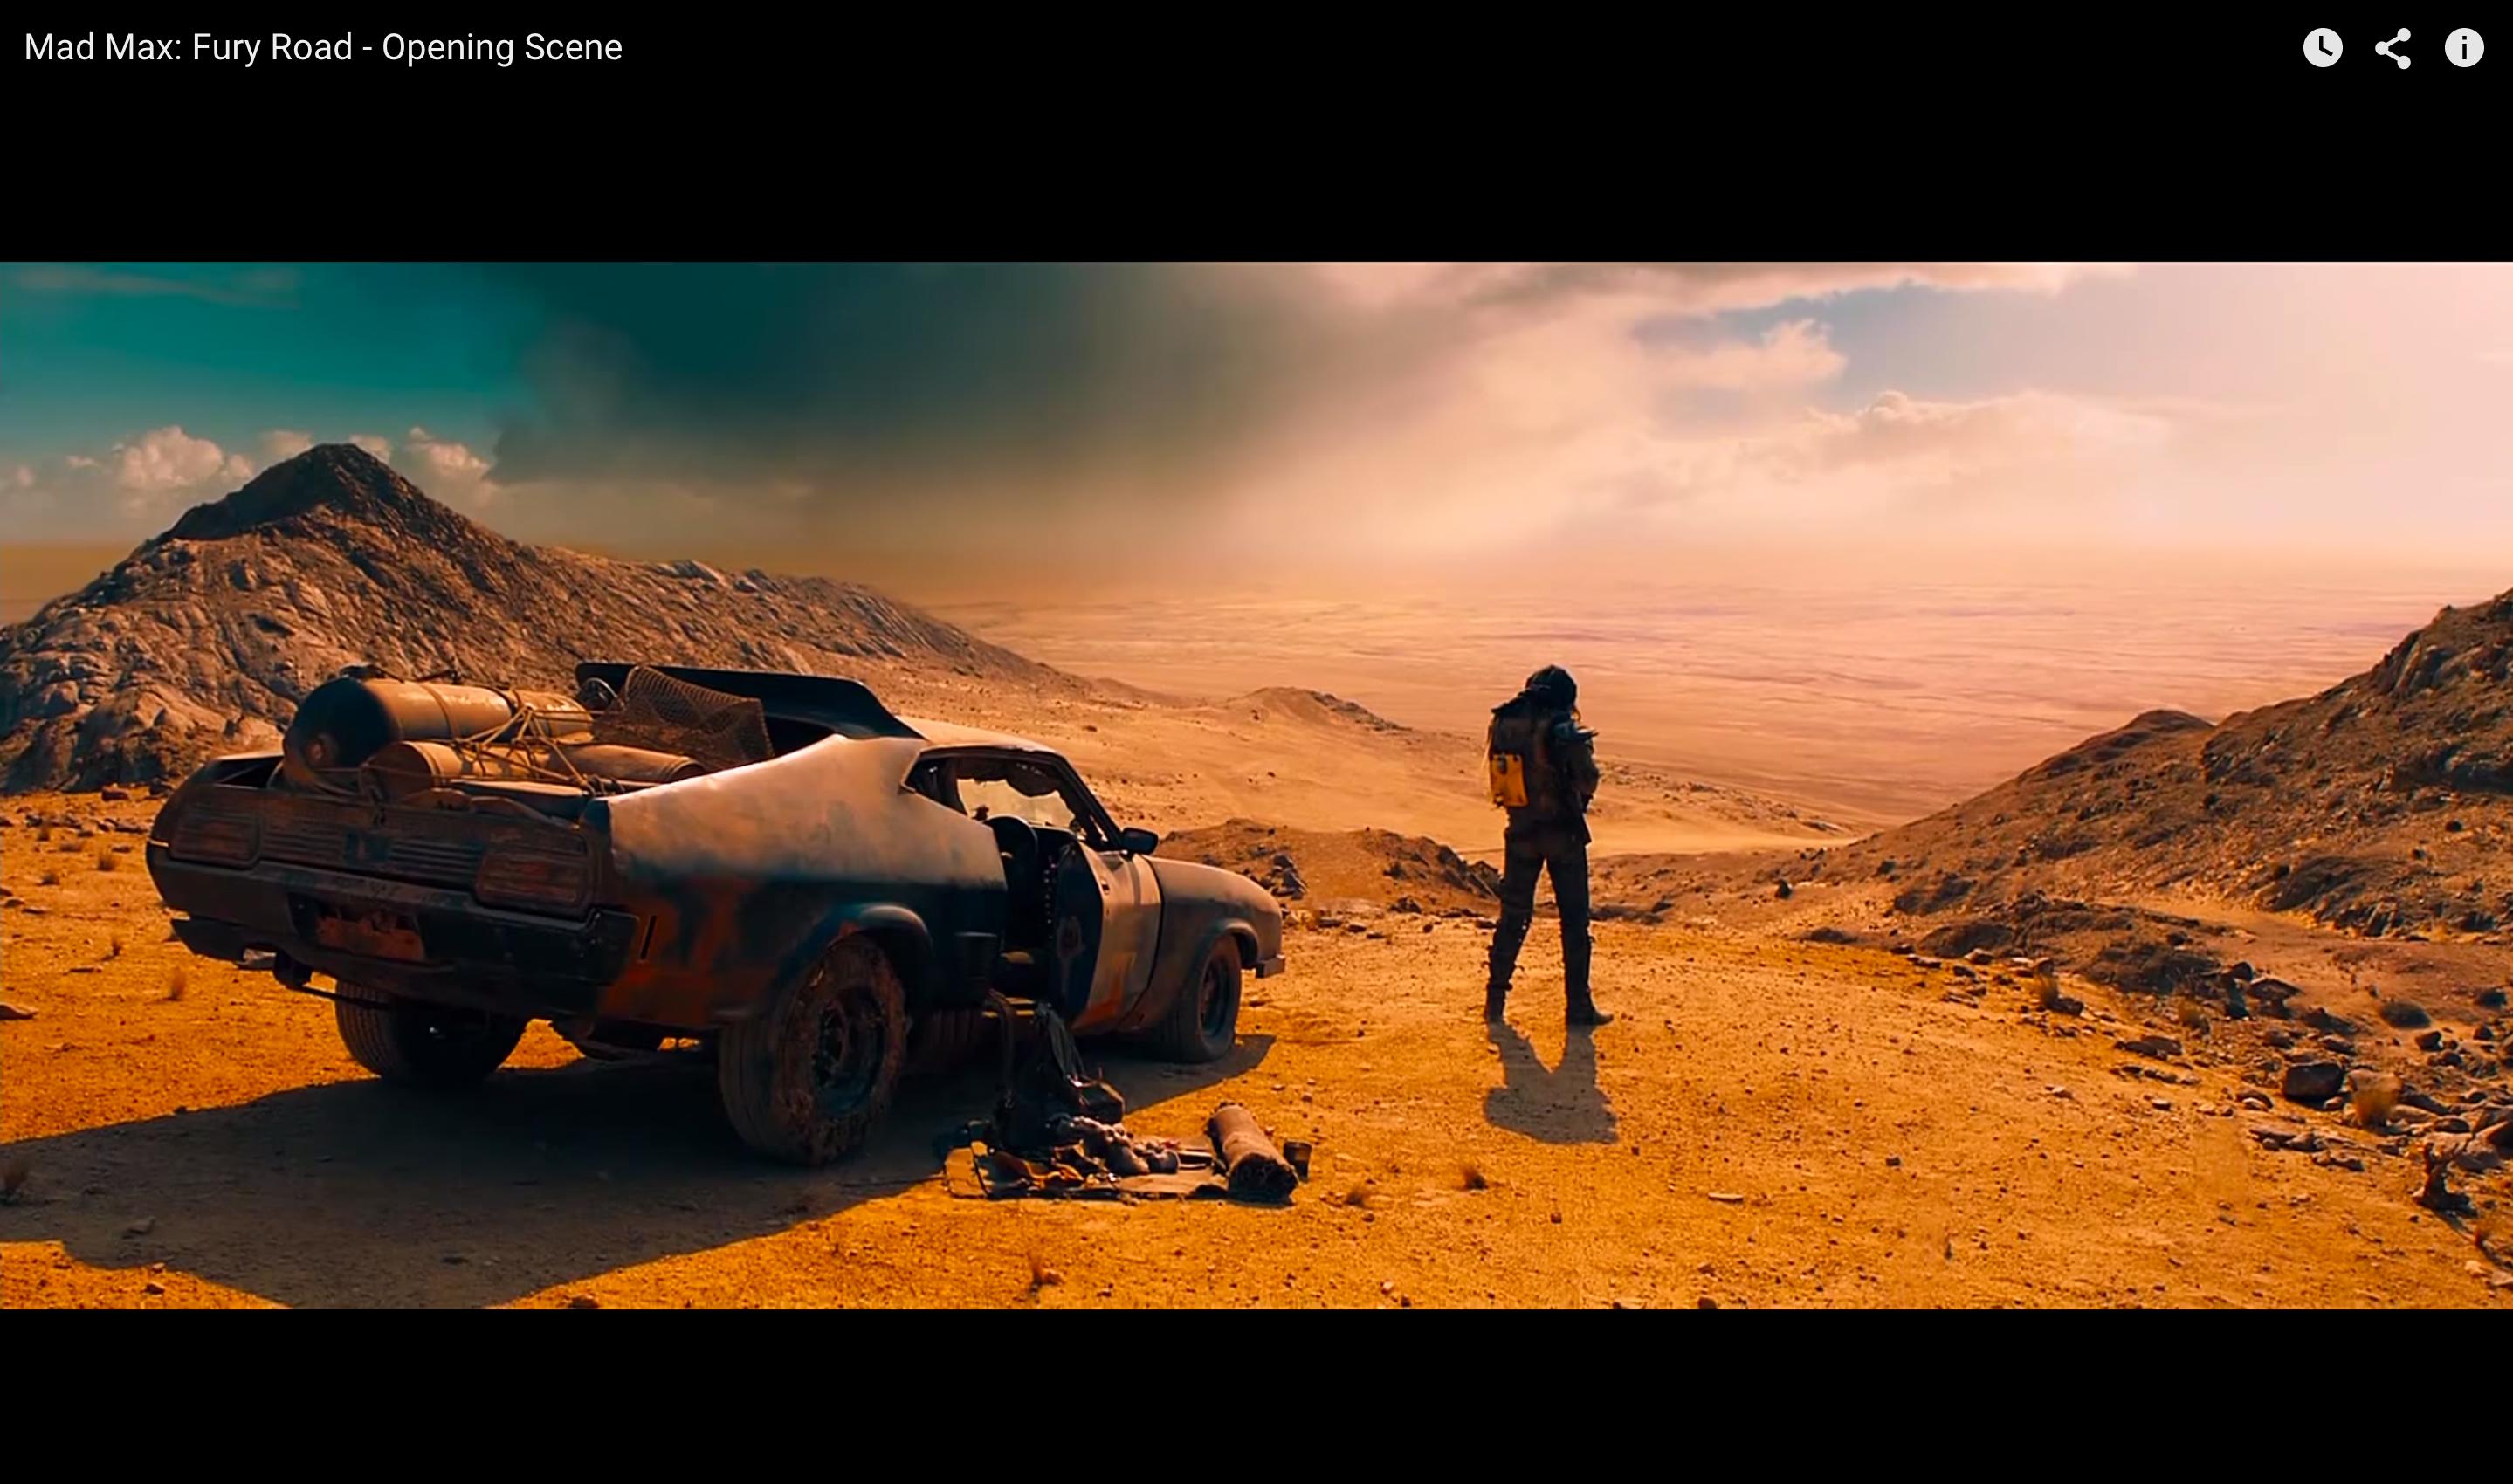 Fury Road Opening Scene